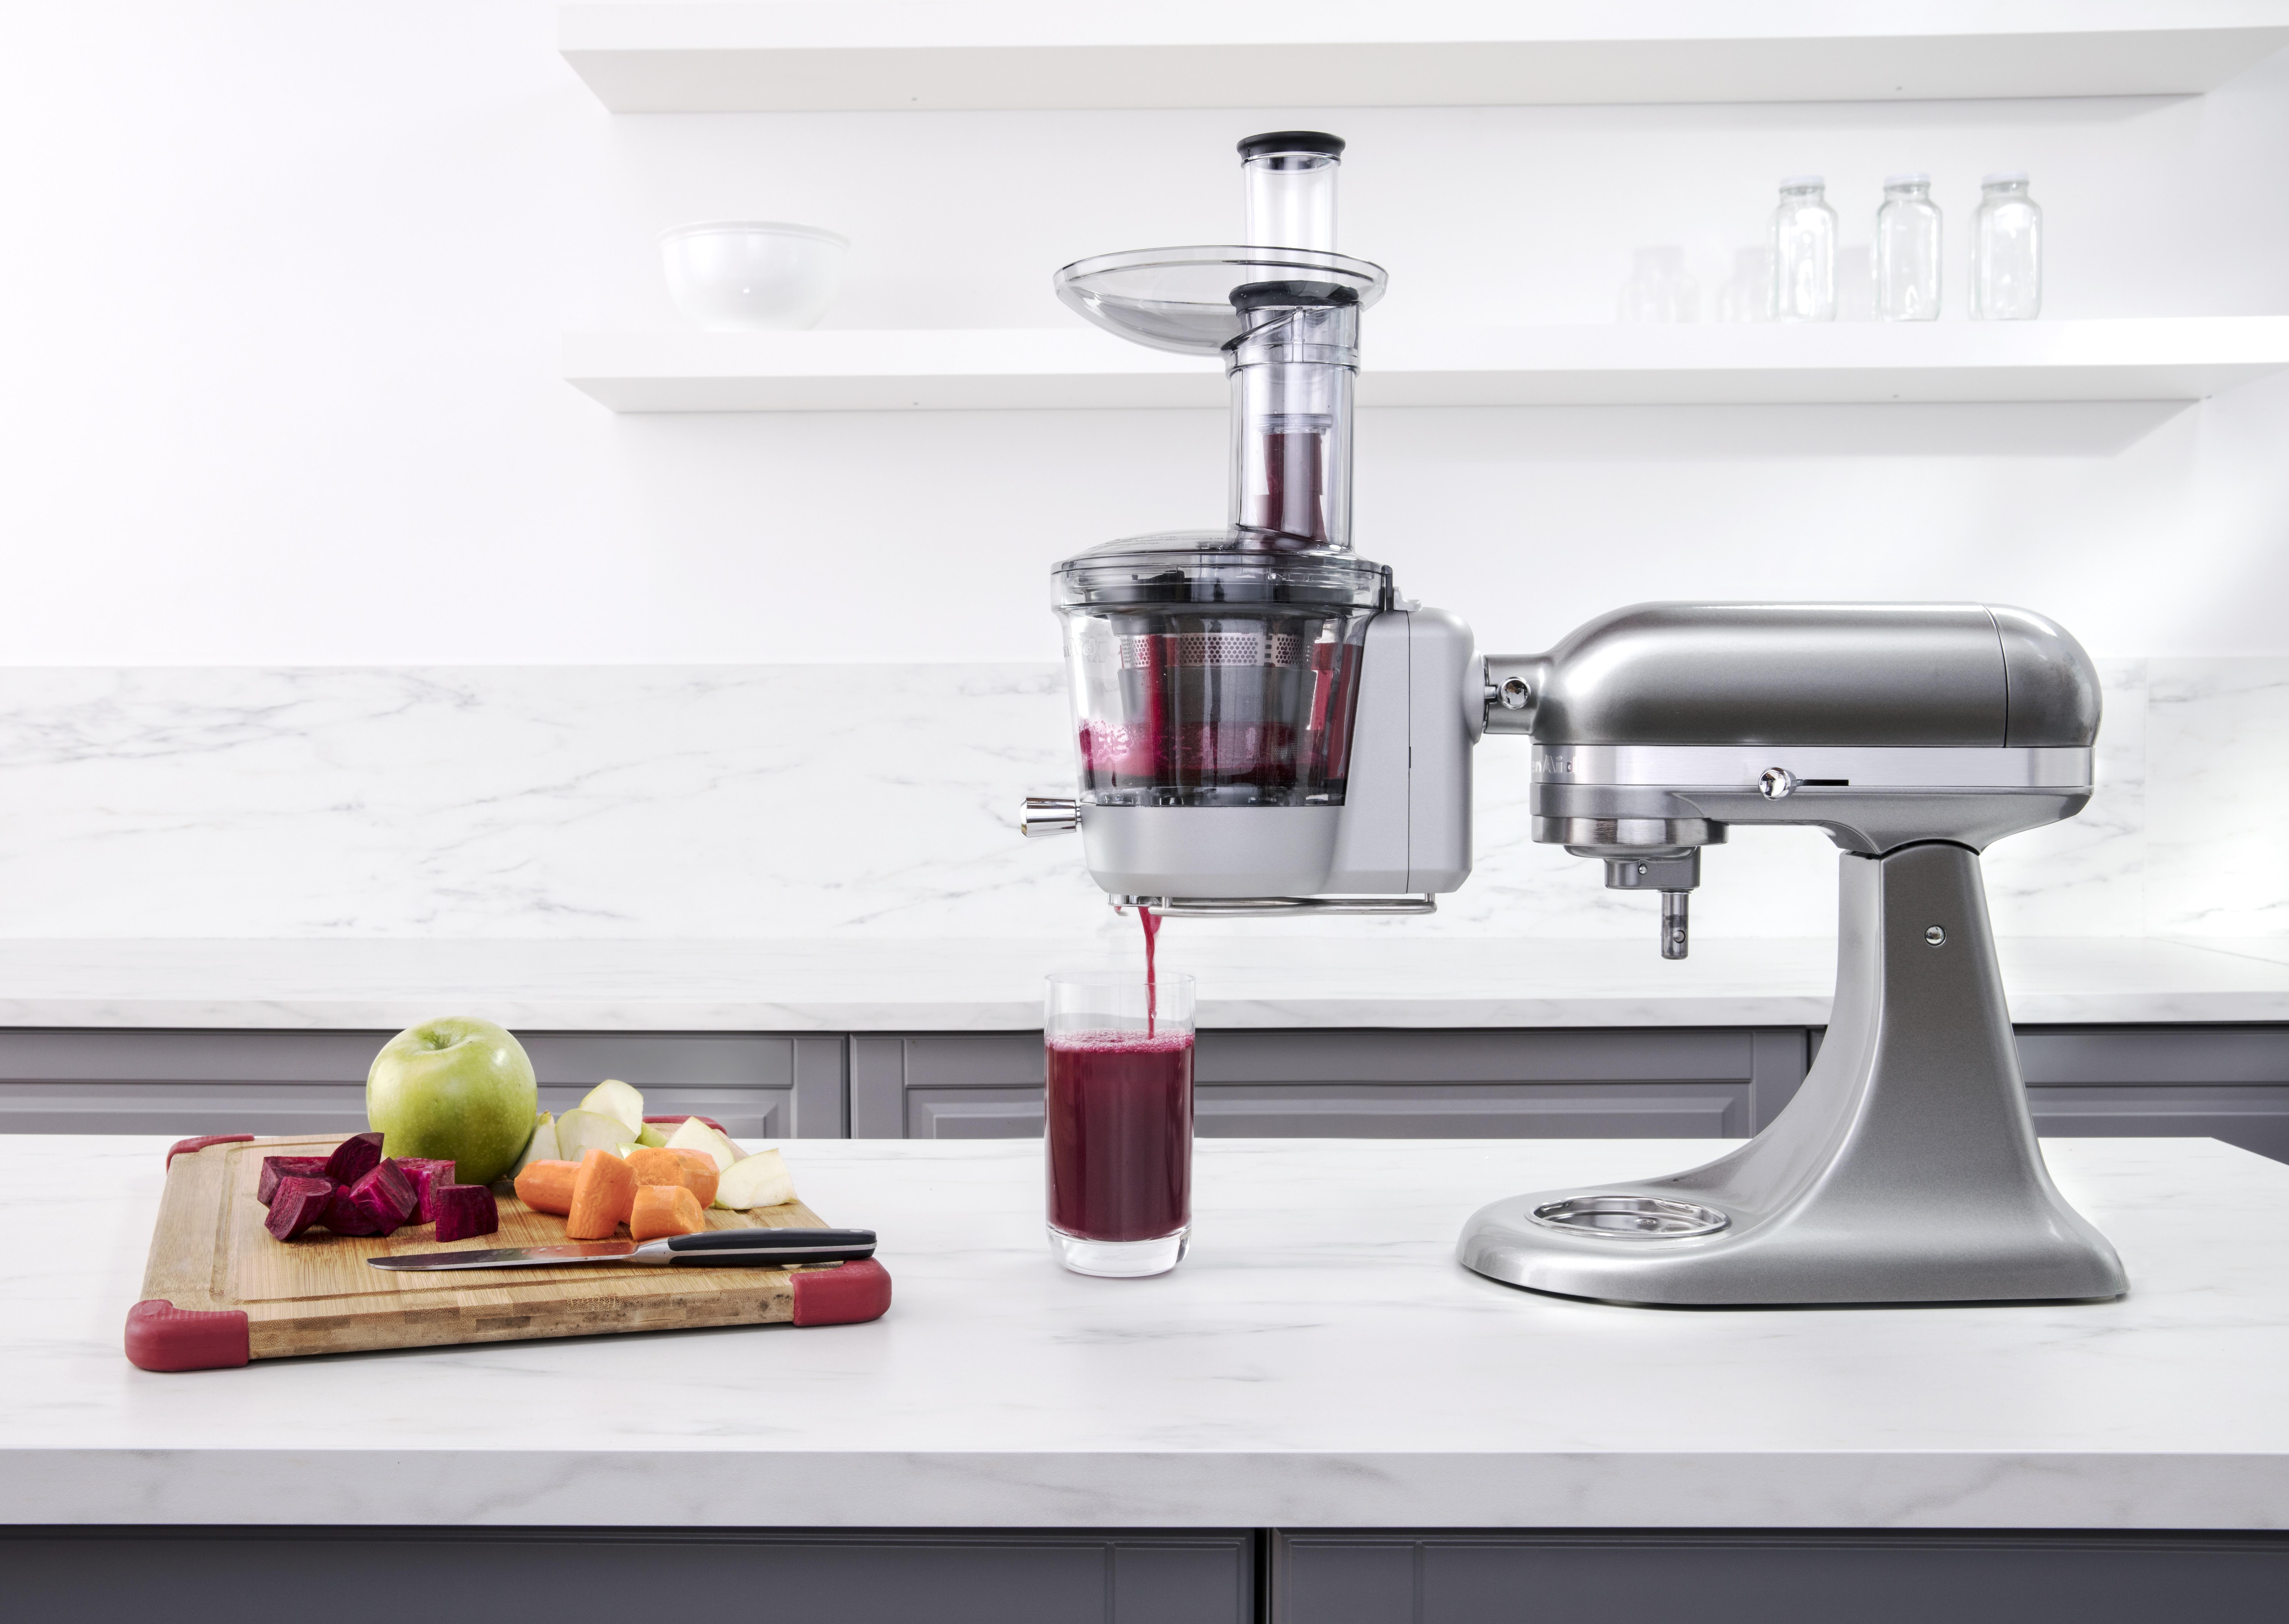 Kitchenaid Juicer And Sauce Attachment Review - Kitchen Appliances ...